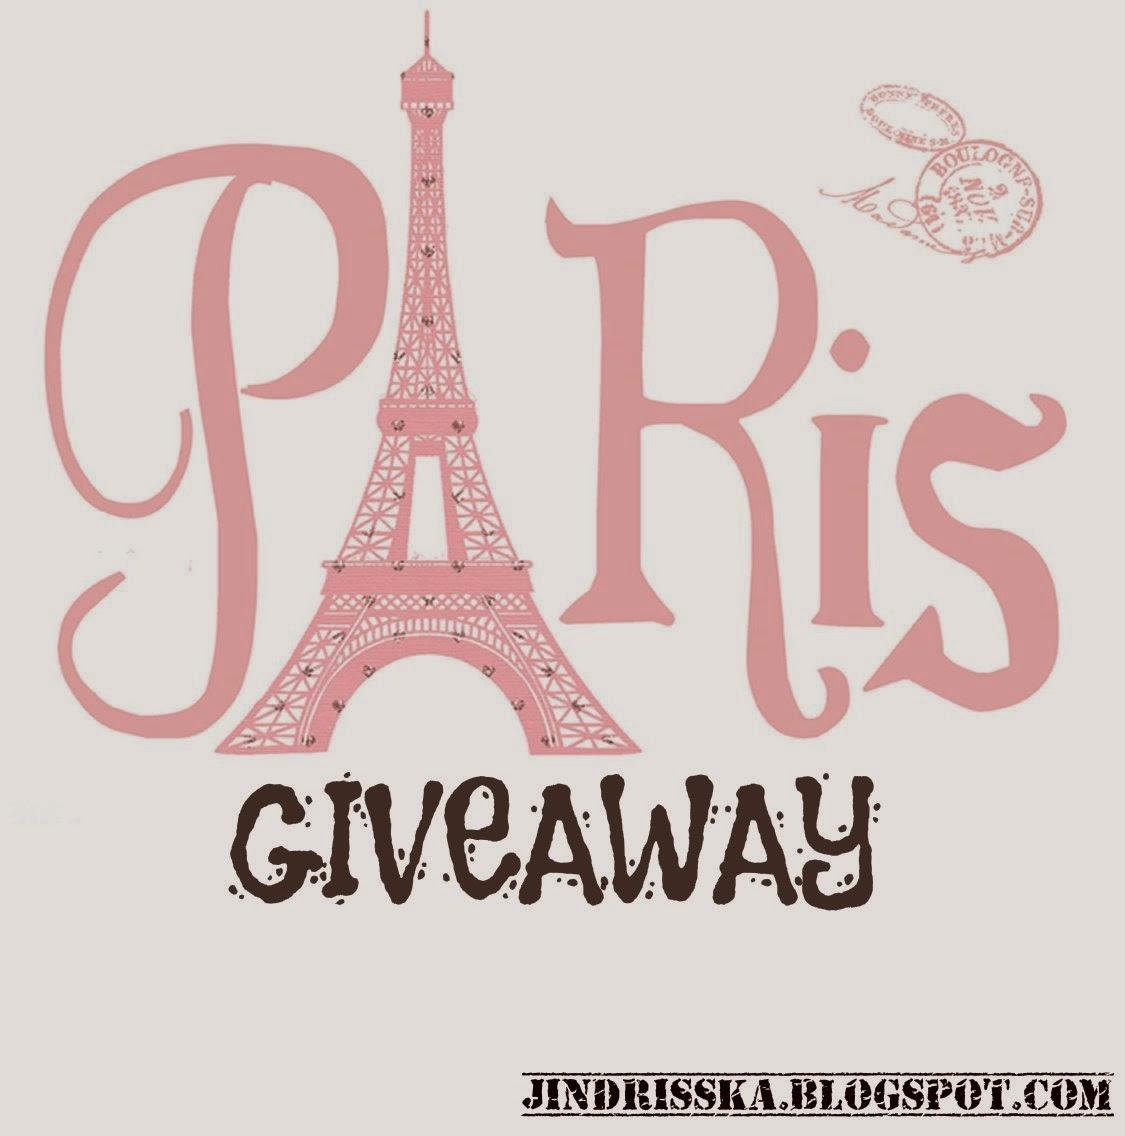 http://jindrisska.blogspot.com/2014/09/paris-souvenirs-giveaway-by-me.html